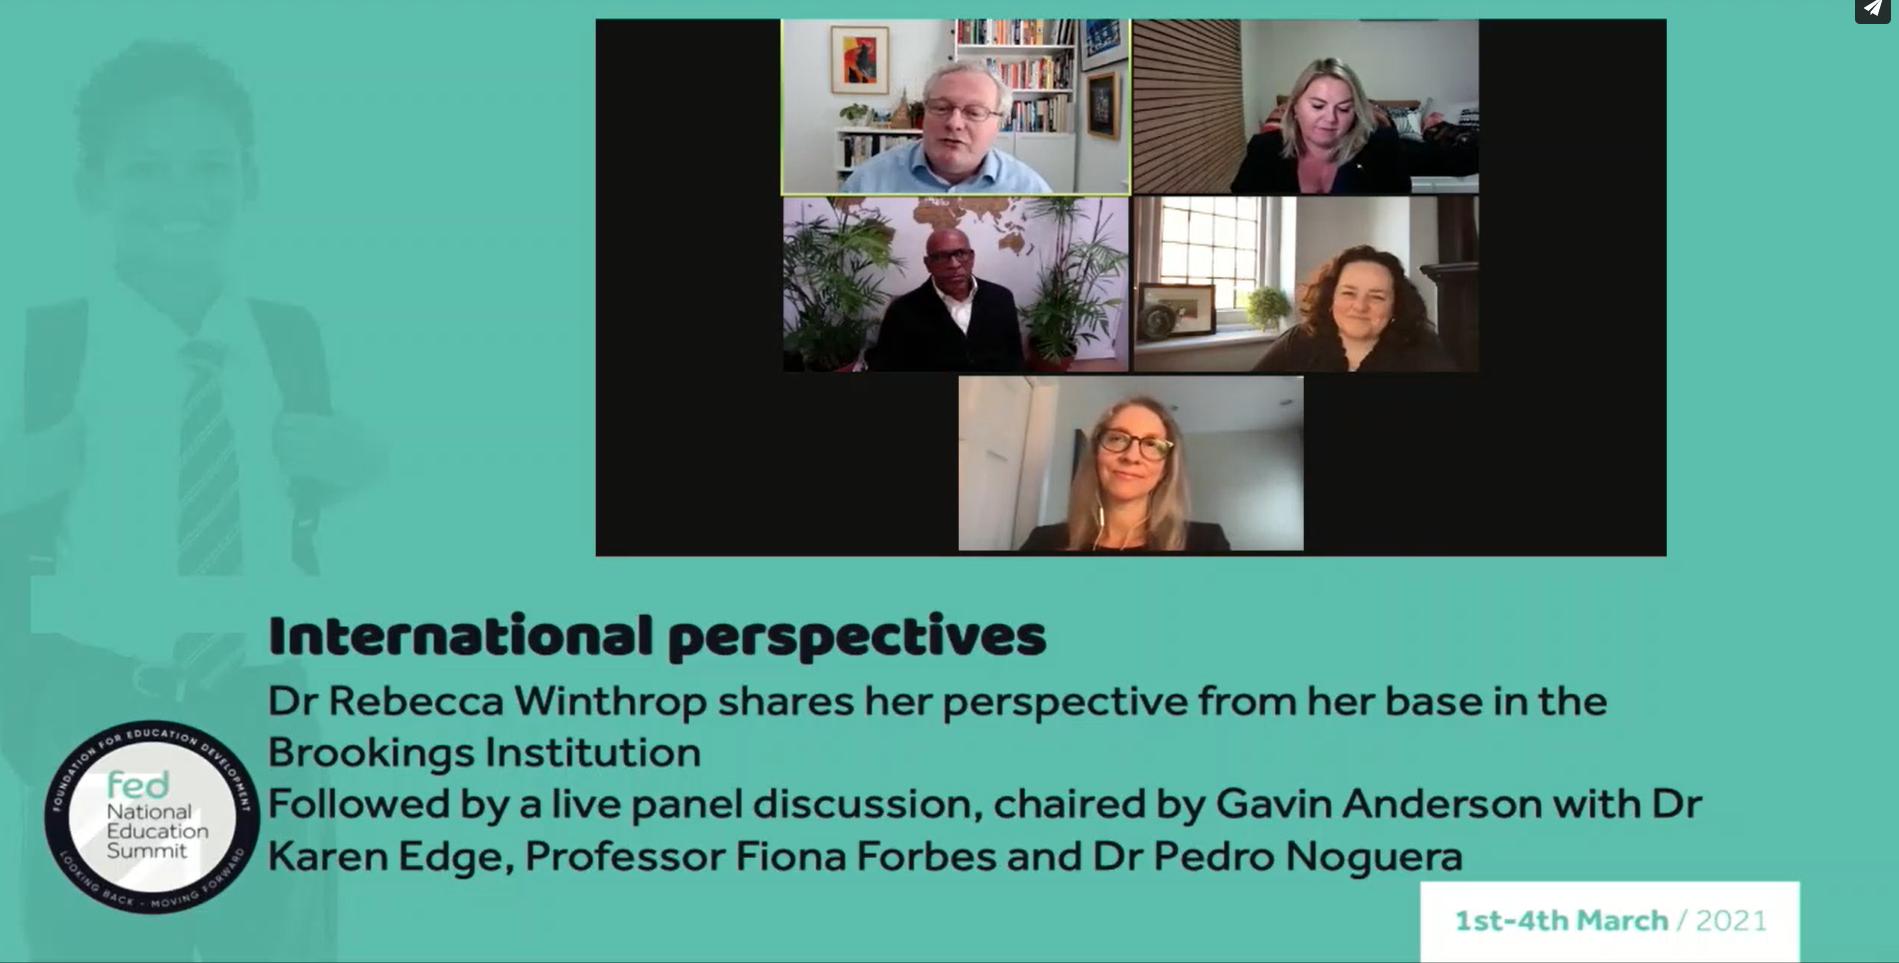 Fedenes Day 3 039 International Perspectives A Look Ahead To Global Education Leaders Partnership 2021 039